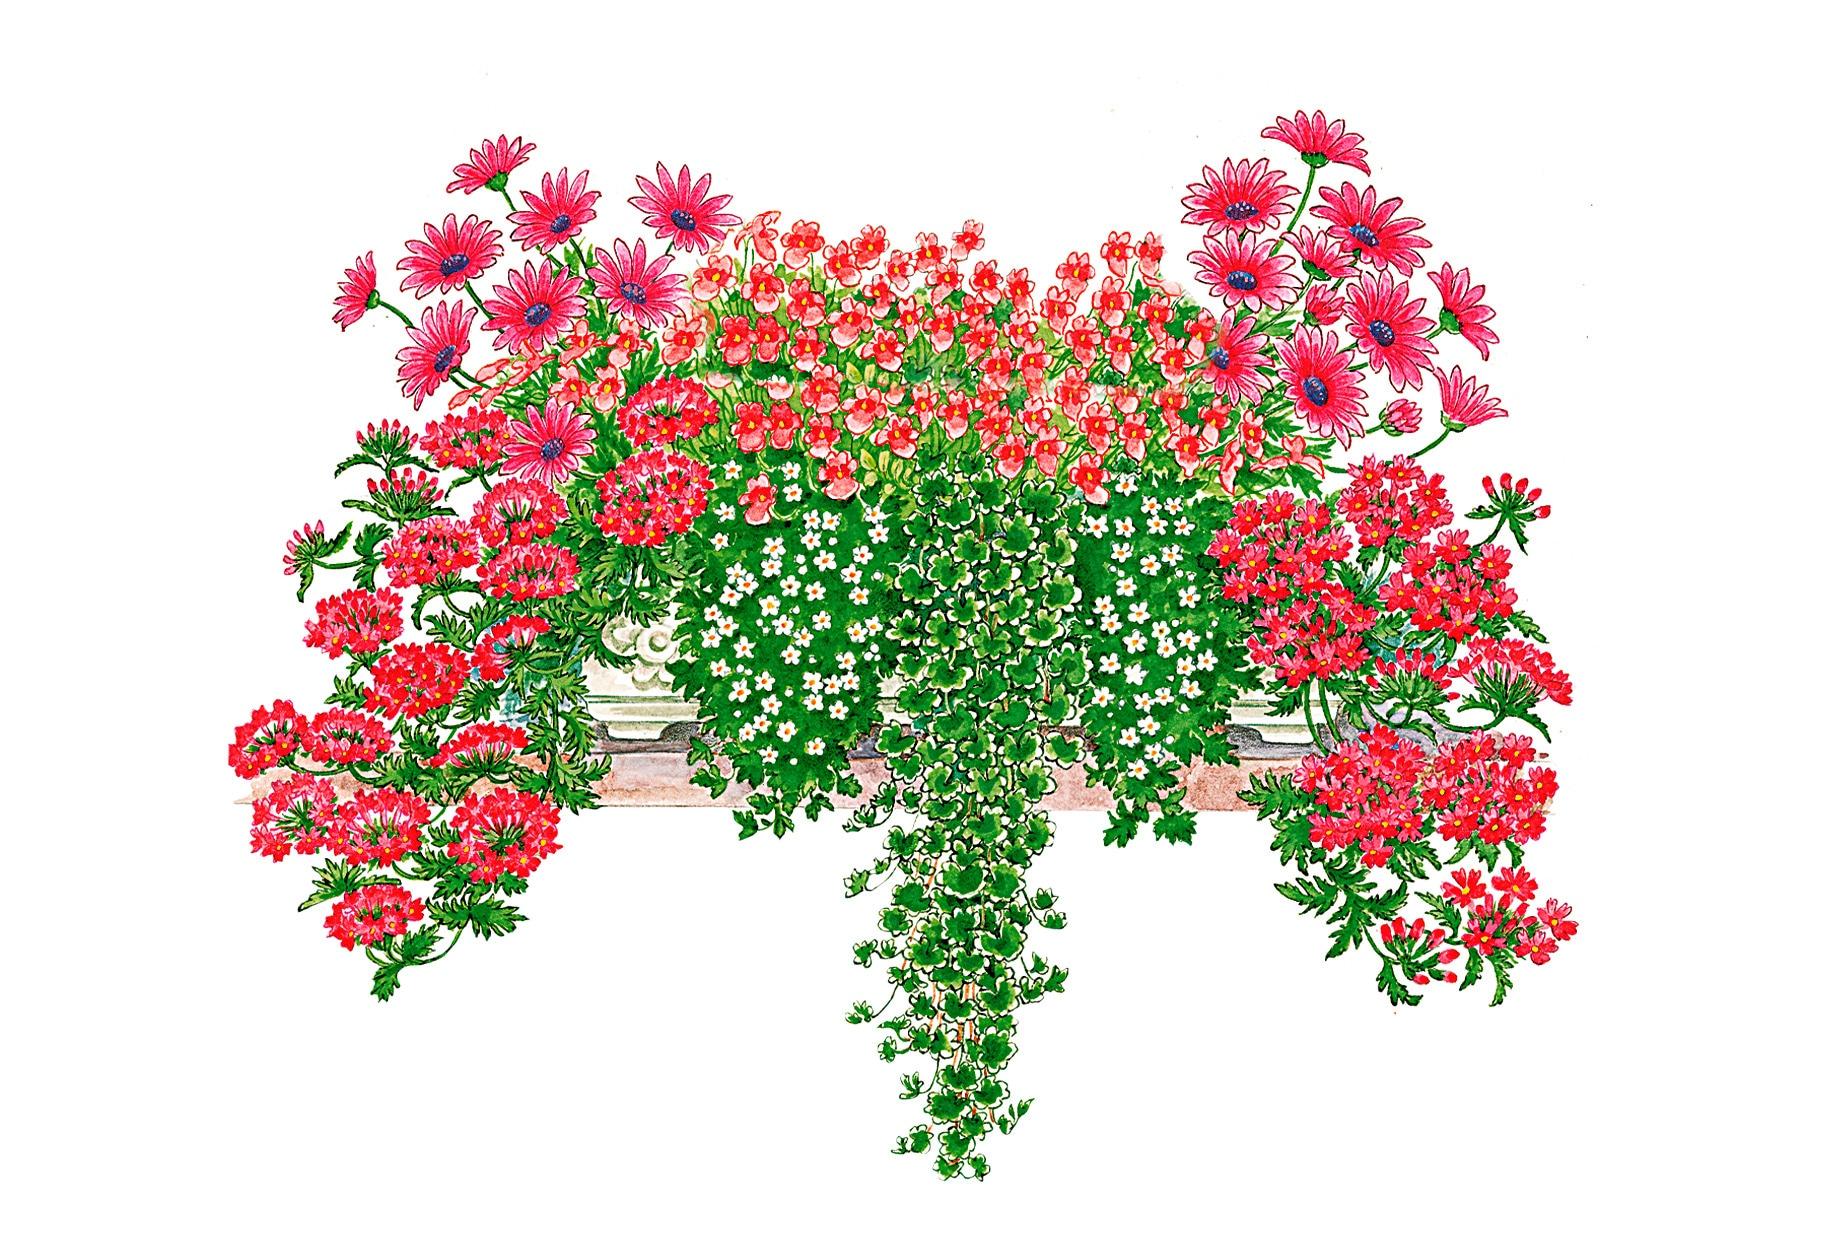 BCM Balkonpflanze Romantische Kombi, 18 Pflanzen mit Erde bunt Balkonpflanzen Garten Balkon